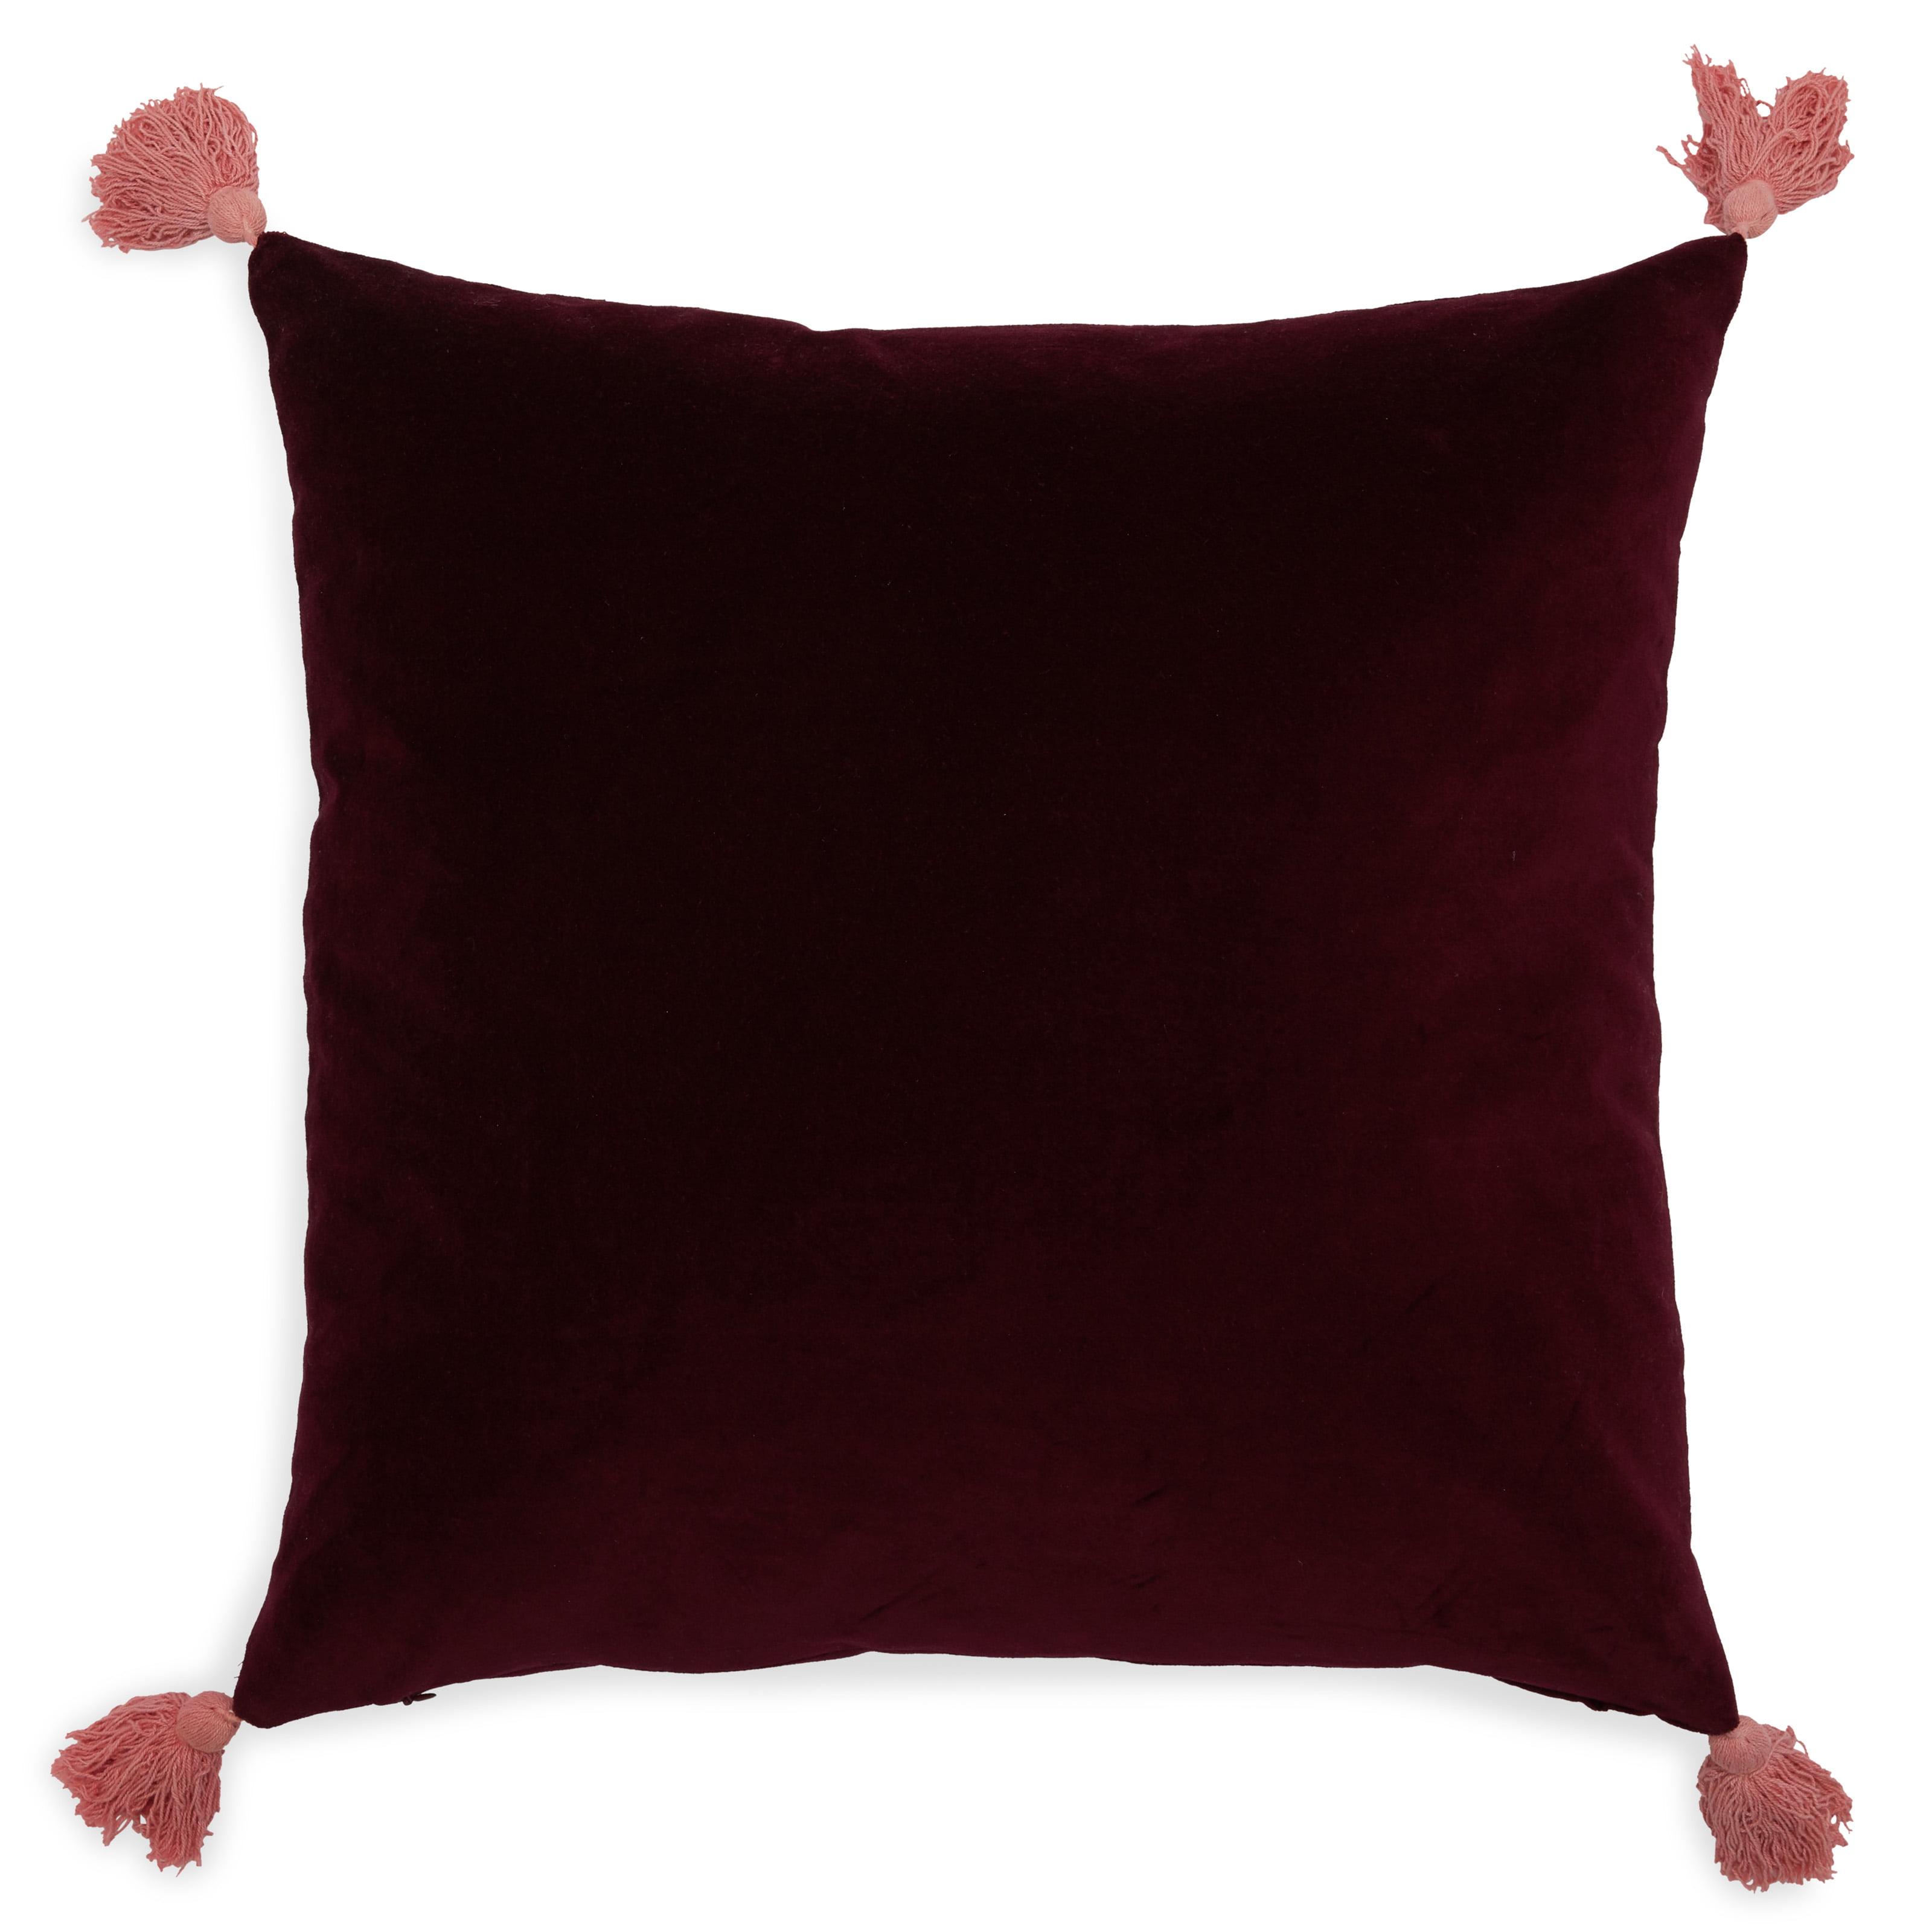 Velvet Decorative Throw Pillow With Tassels 20x20 By Drew Barrymore Flower Home Walmart Com Walmart Com